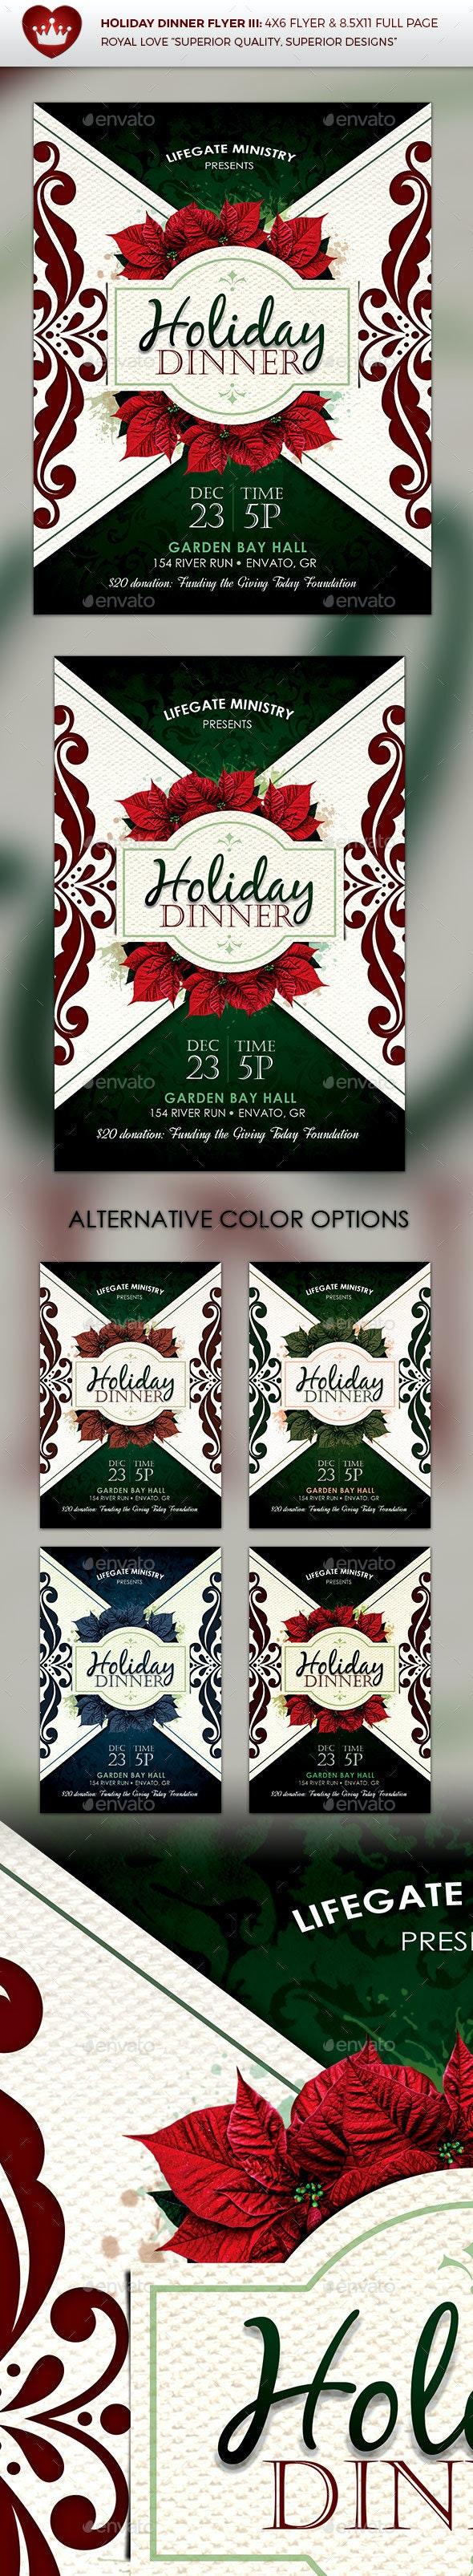 Holiday Dinner Flyer III - Holidays Events